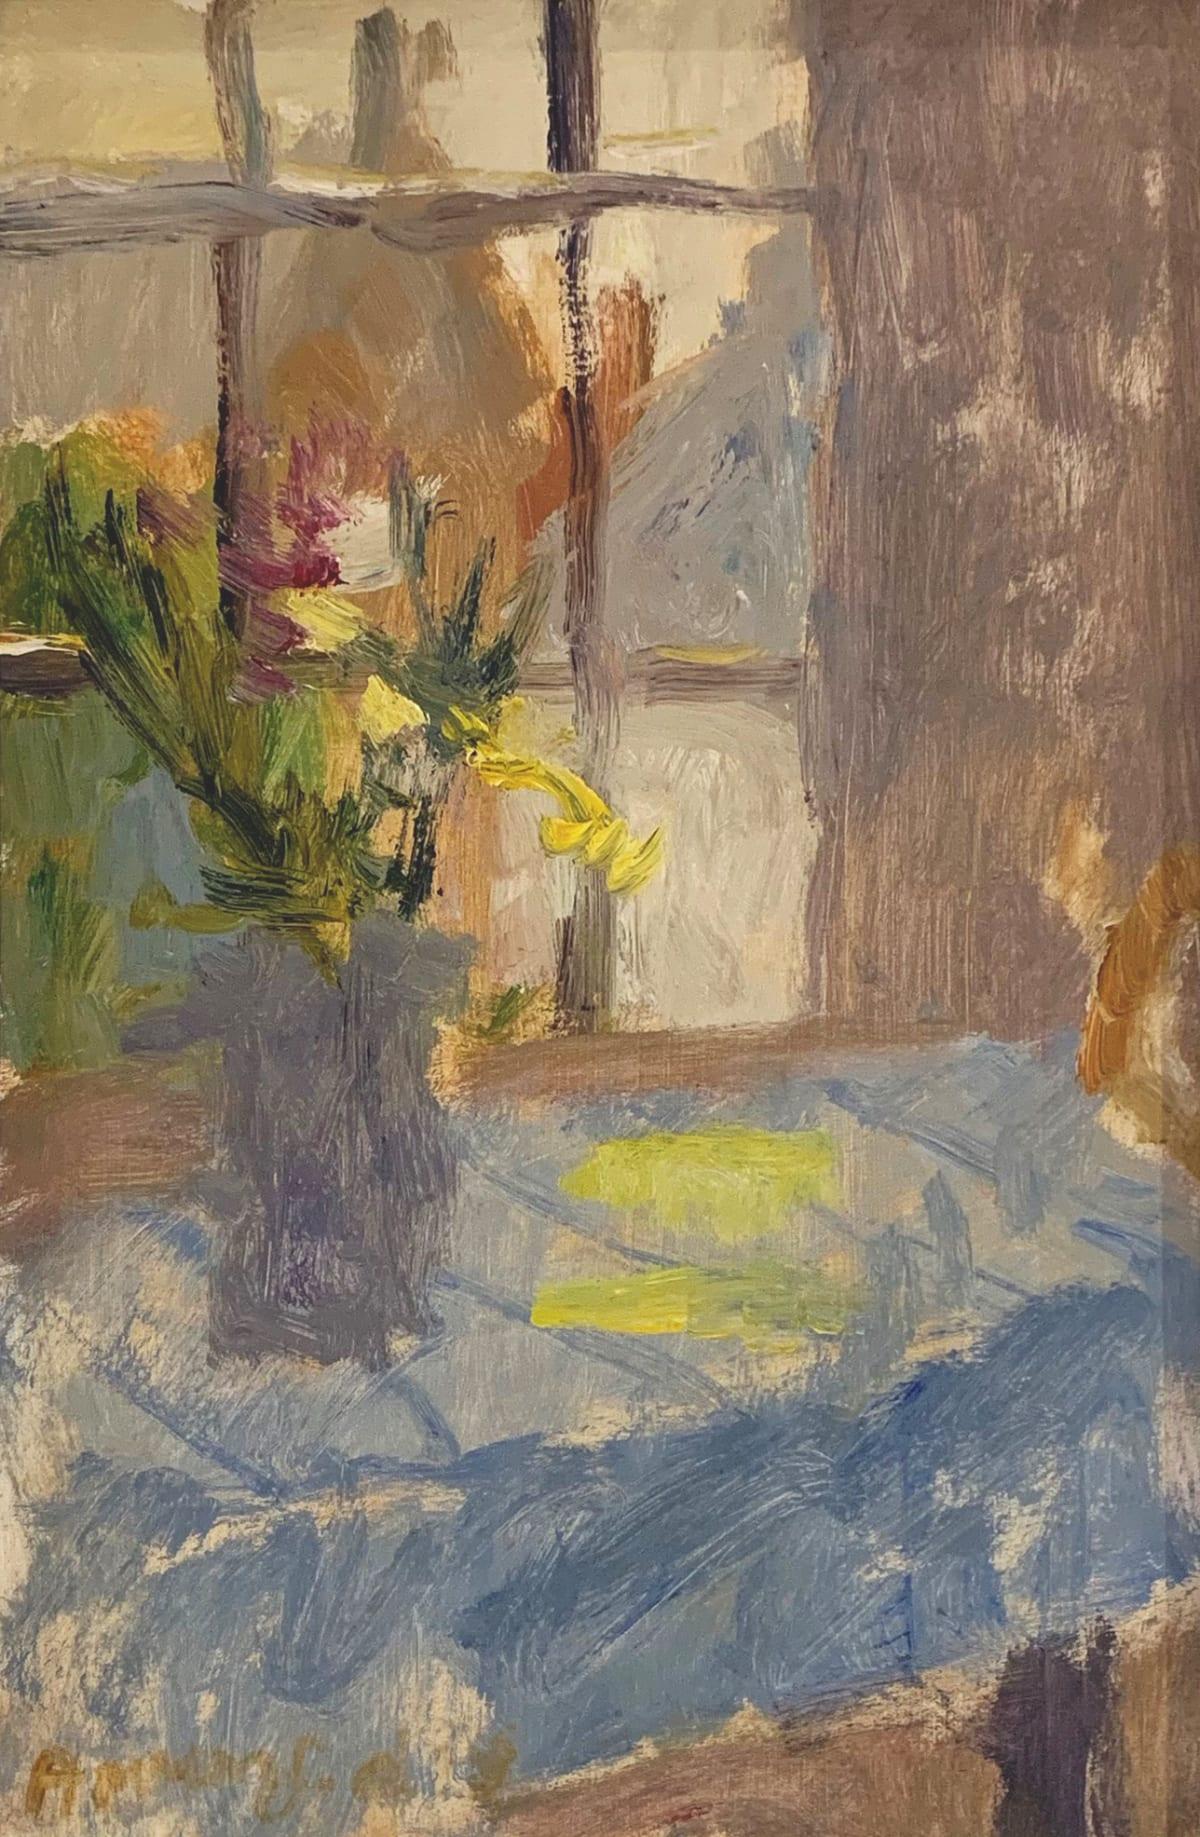 Alice Mumford, The Studio, St Ives School of Painting, 2018